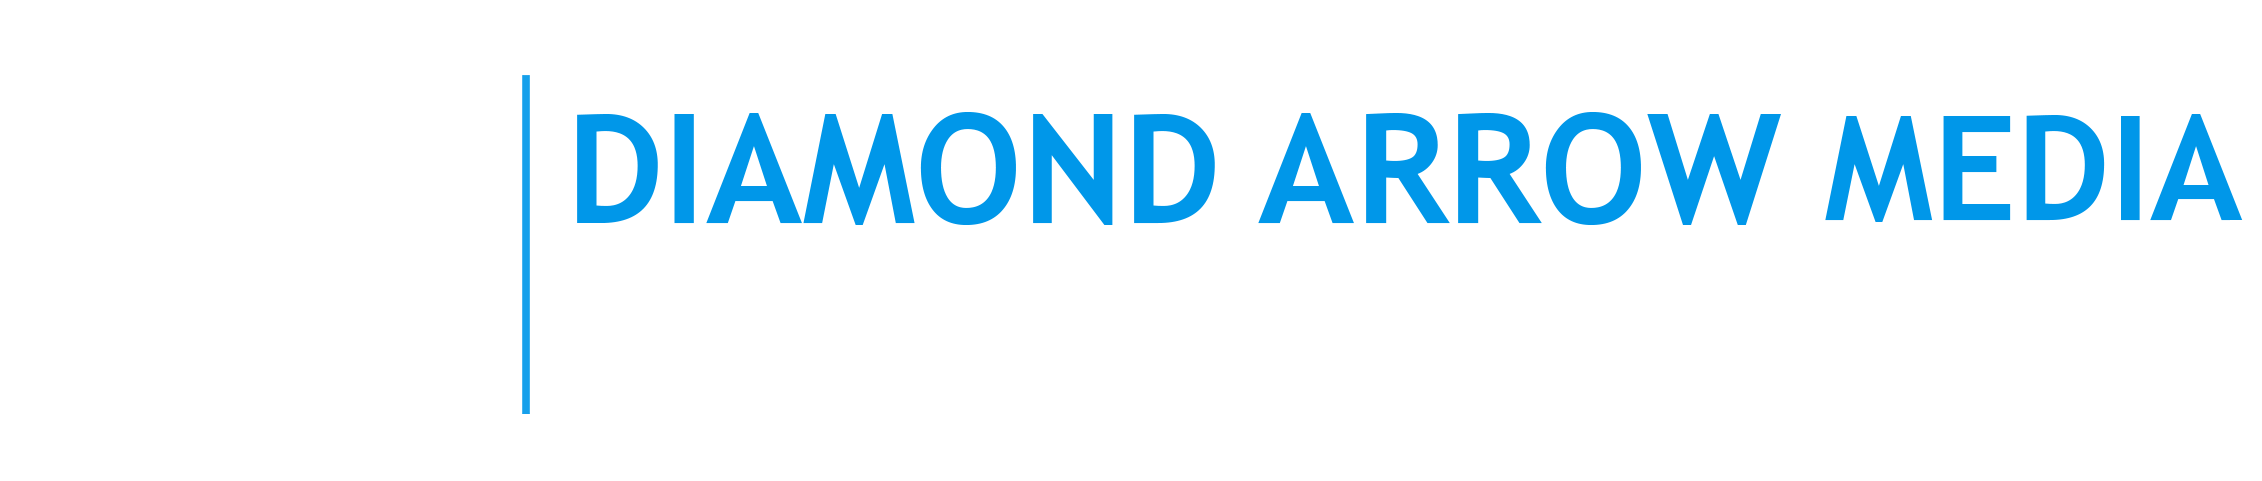 Diamond Arrow Media